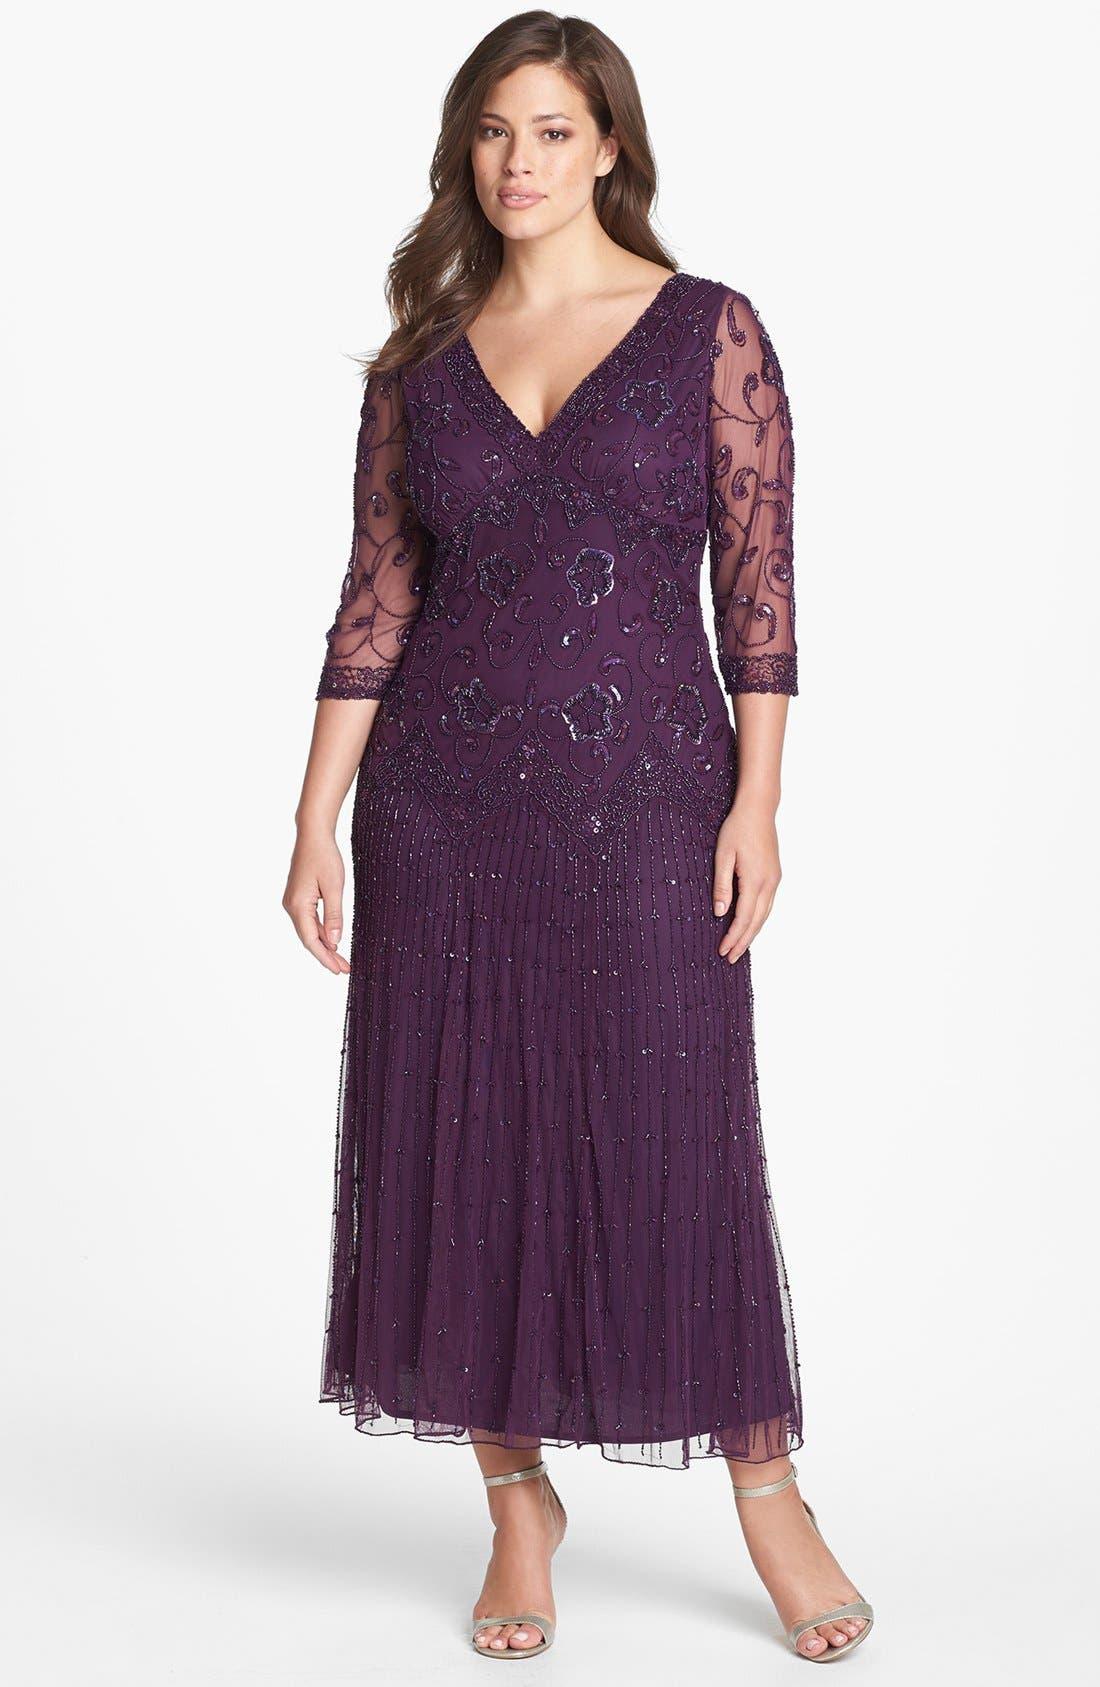 Alternate Image 1 Selected - Pisarro Nights Beaded Mesh Gown (Plus Size)